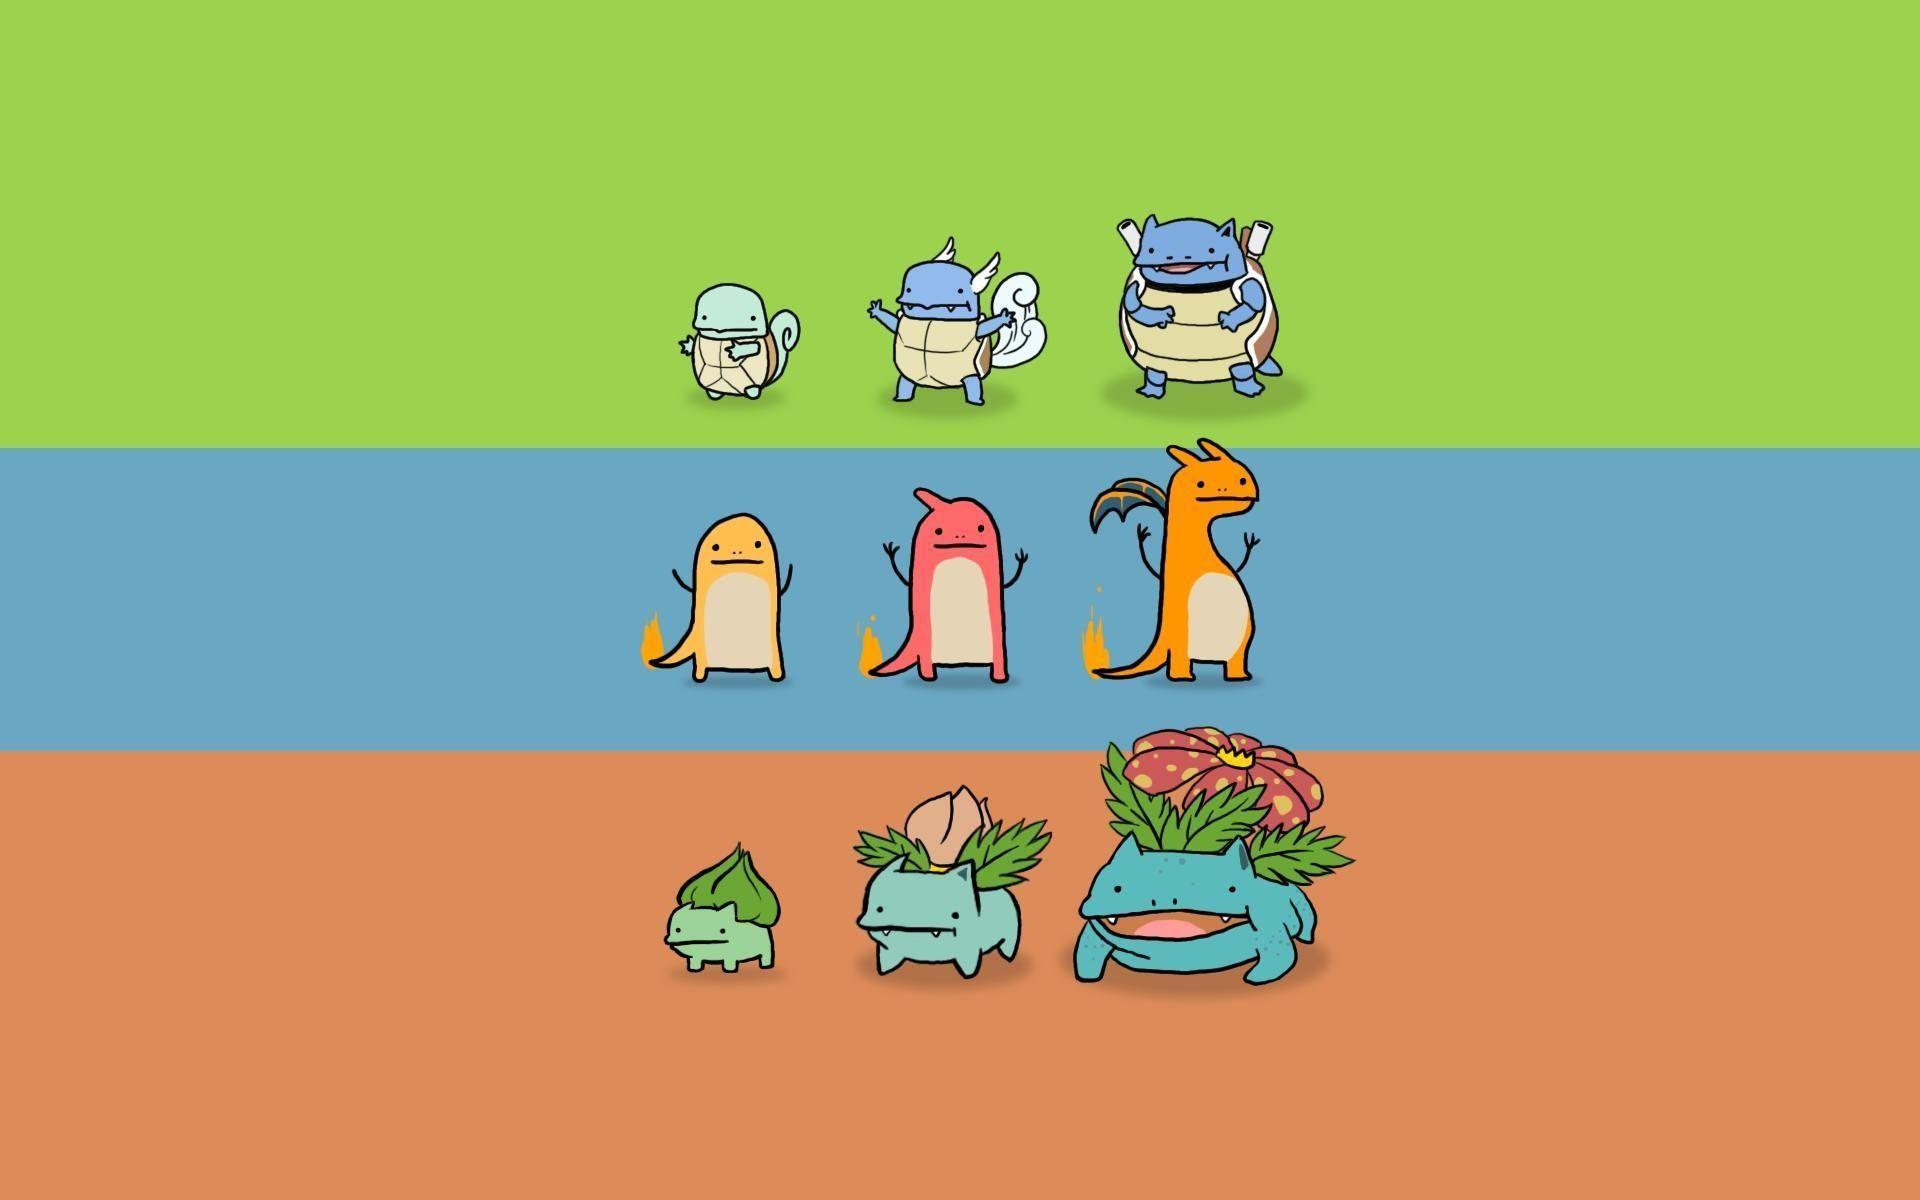 Cute Pokemon Wallpaper